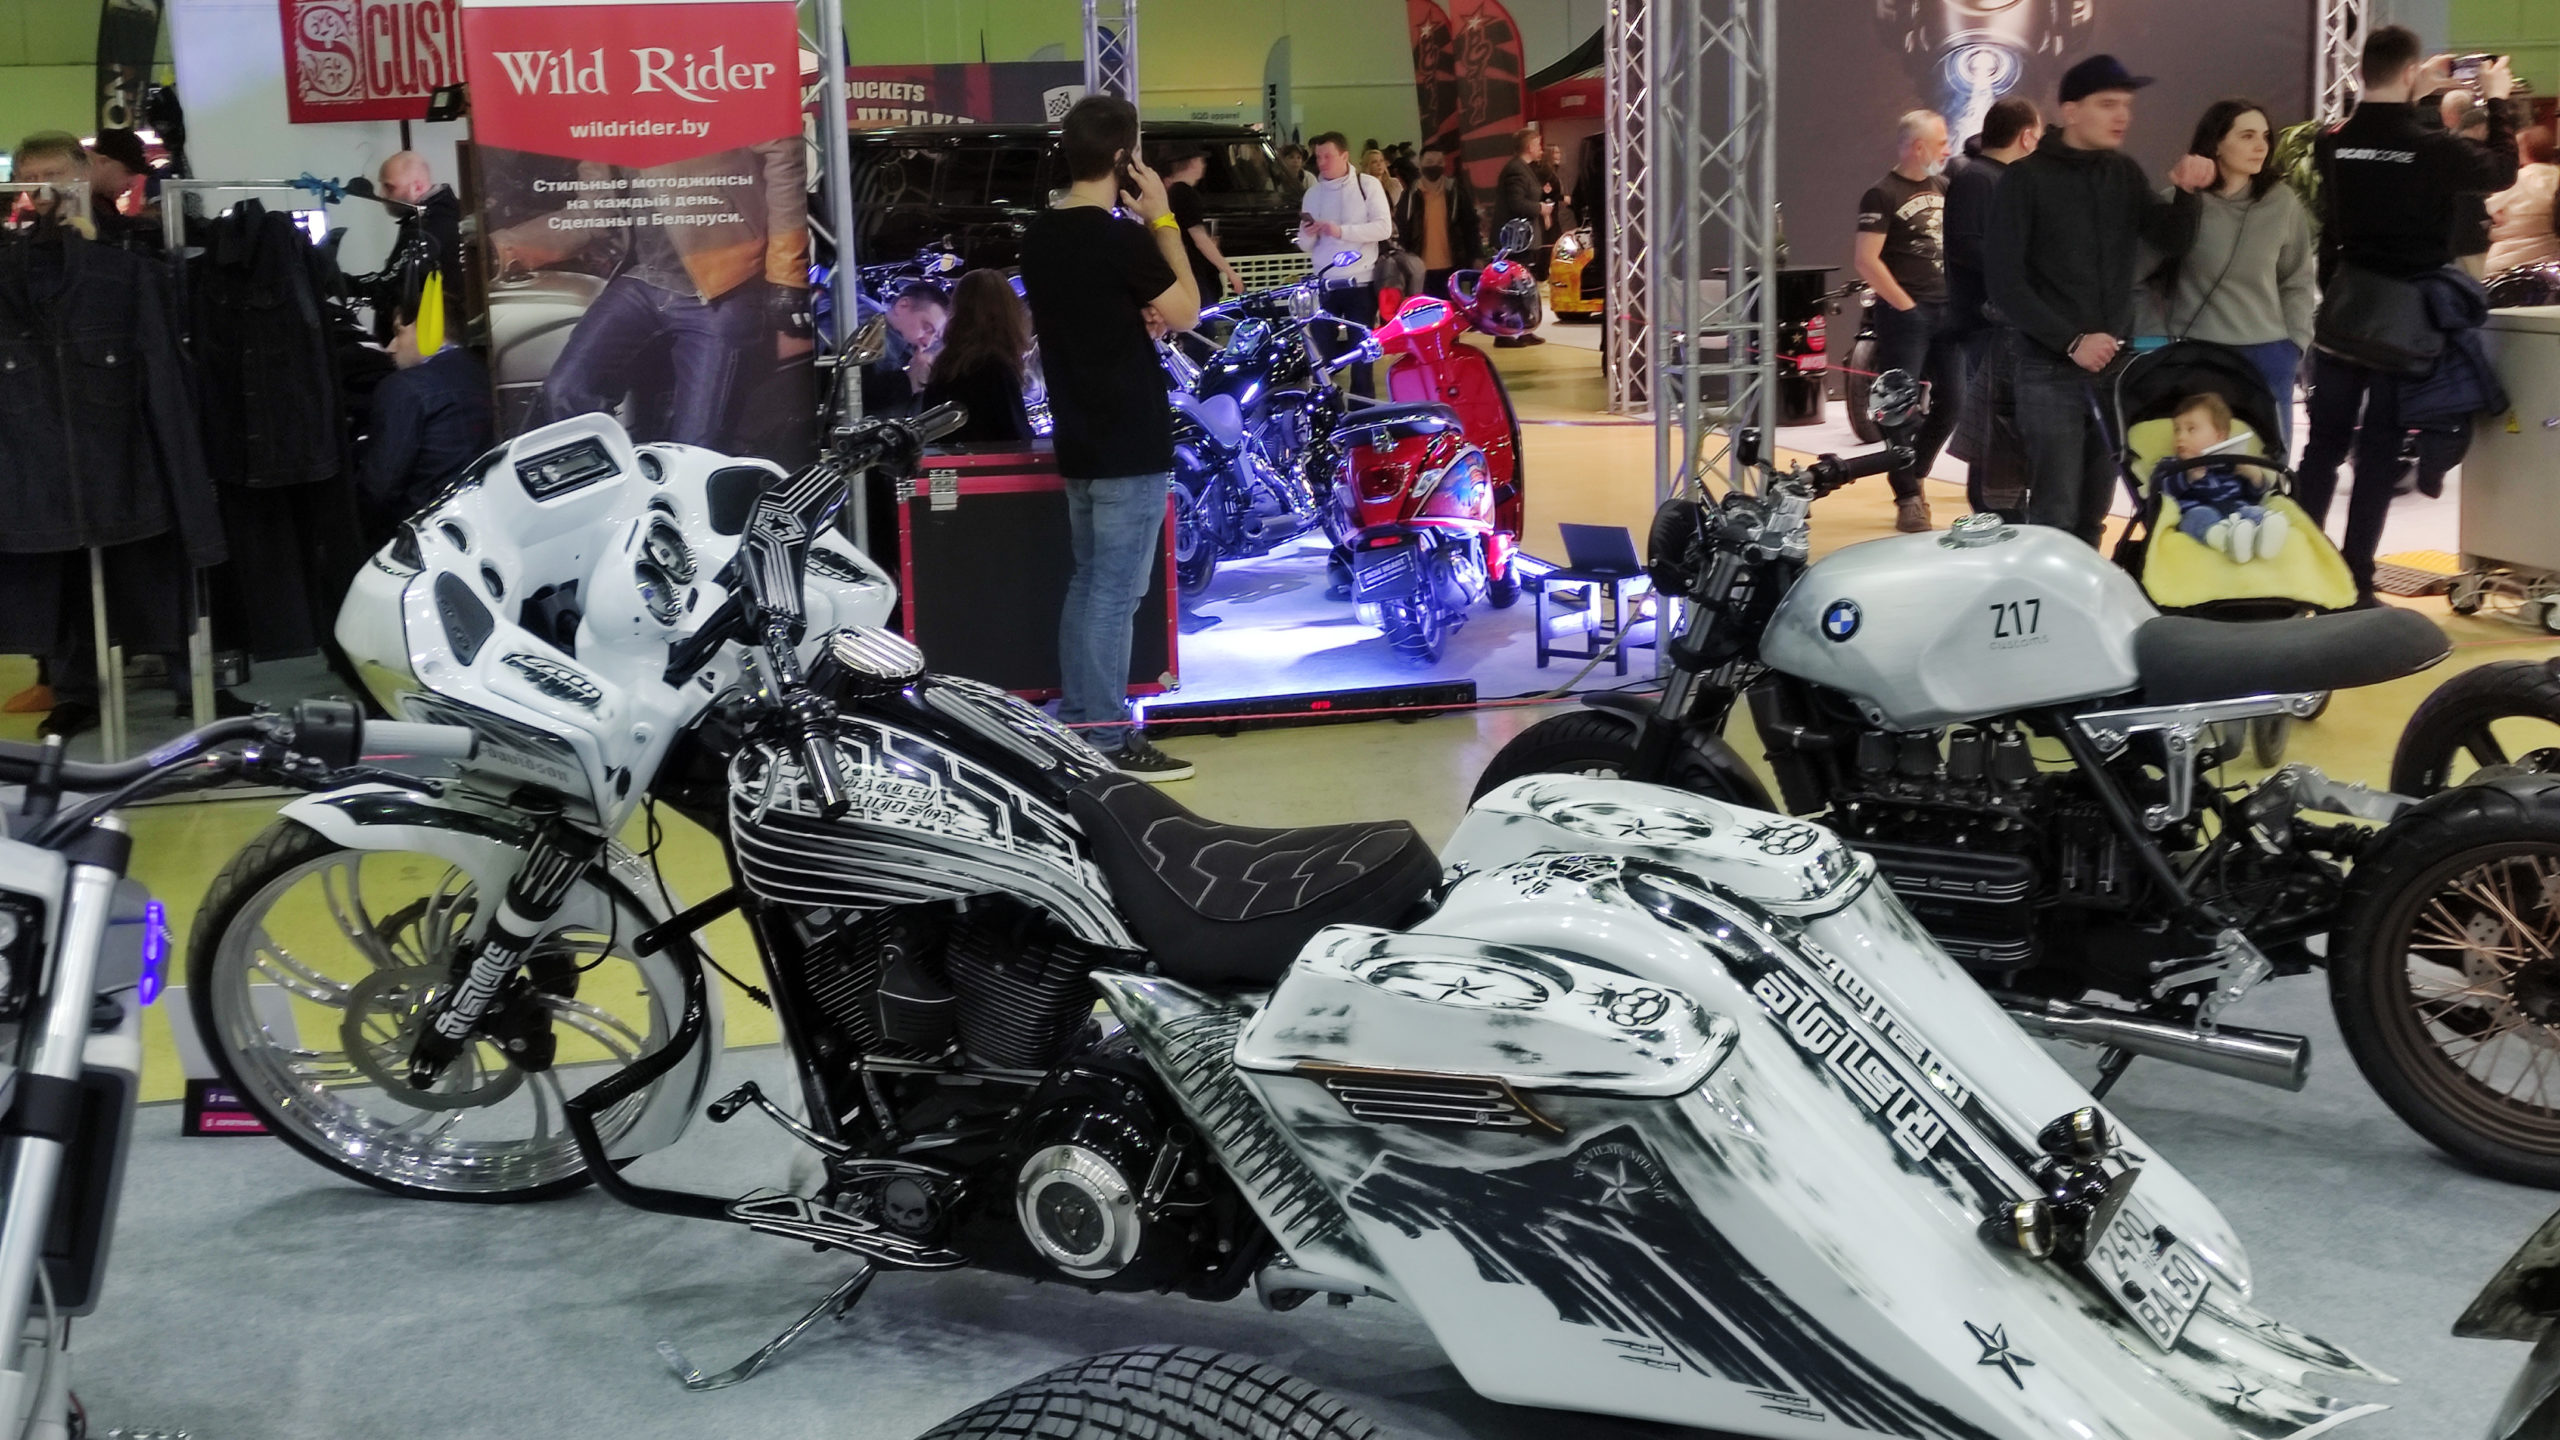 Выставка Мотовесна 2021: мототехника и решения для её безопасности